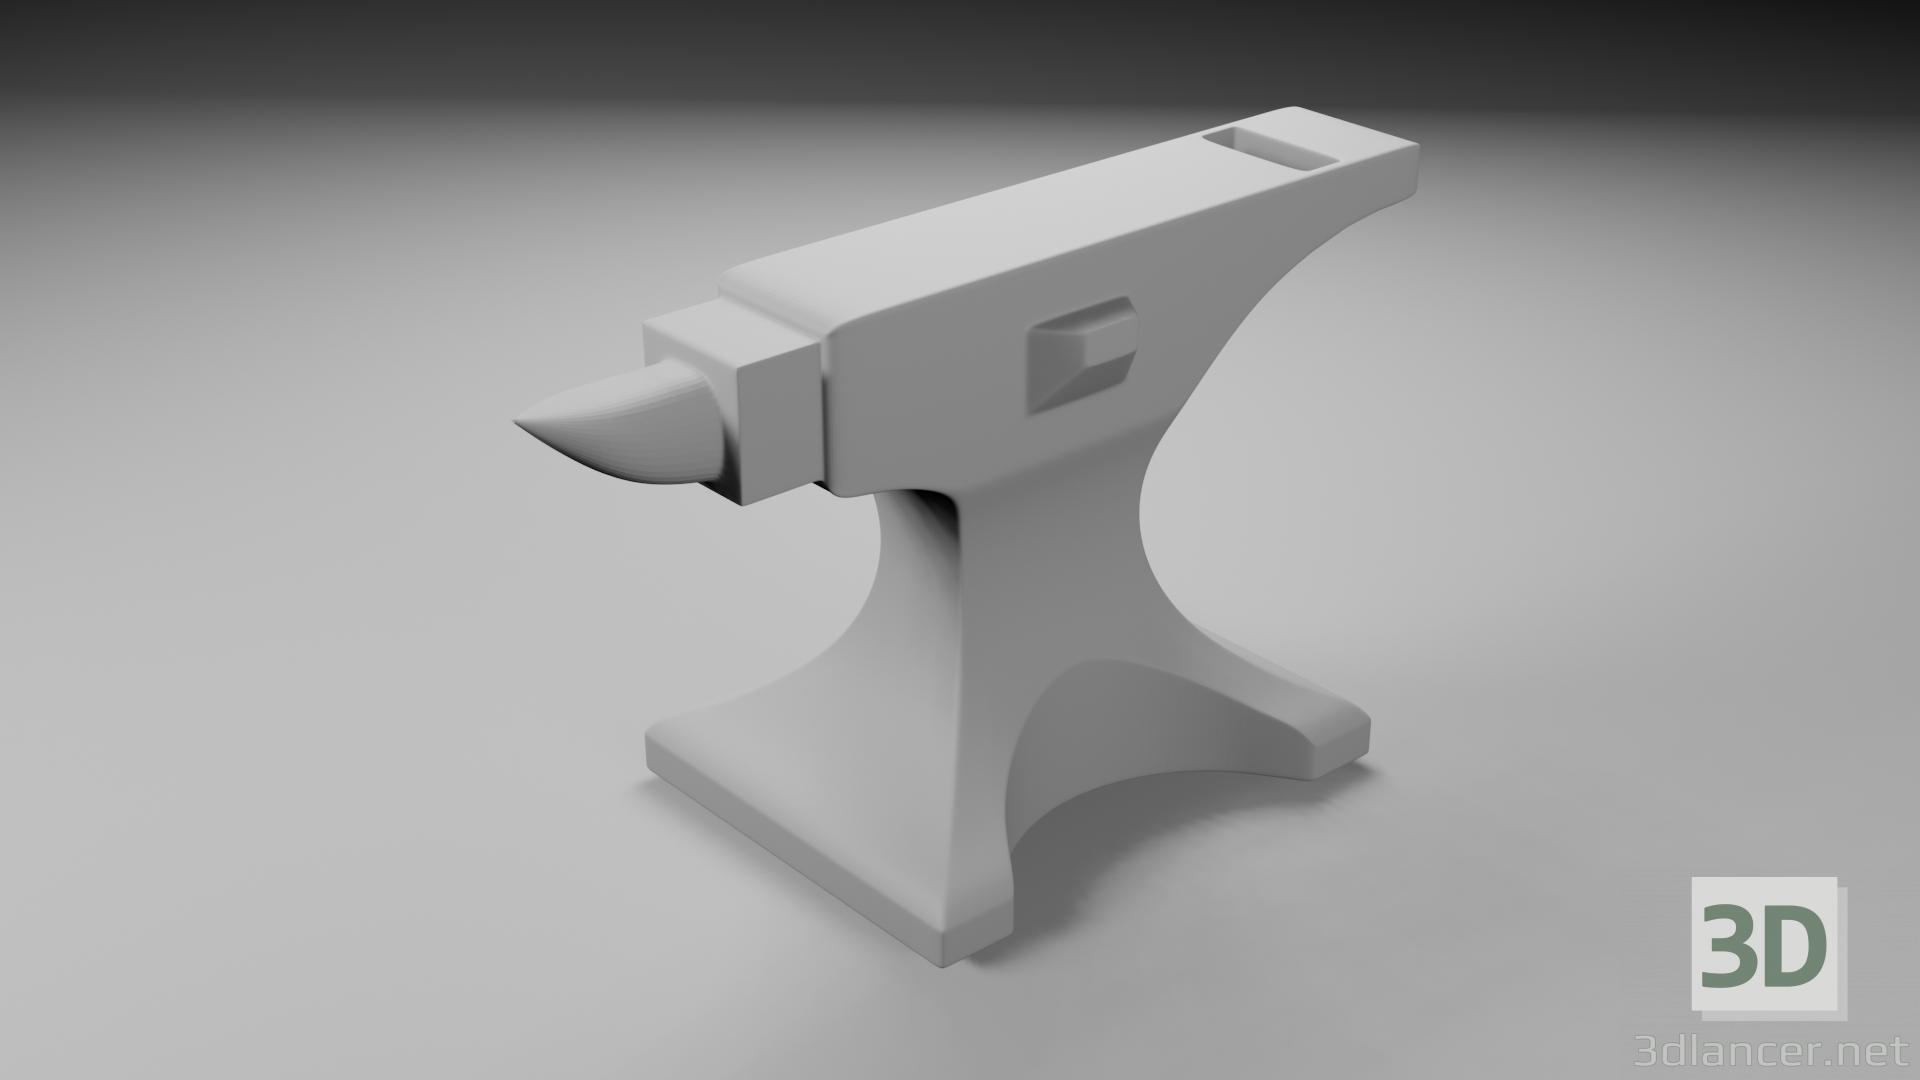 3d Anvil model buy - render